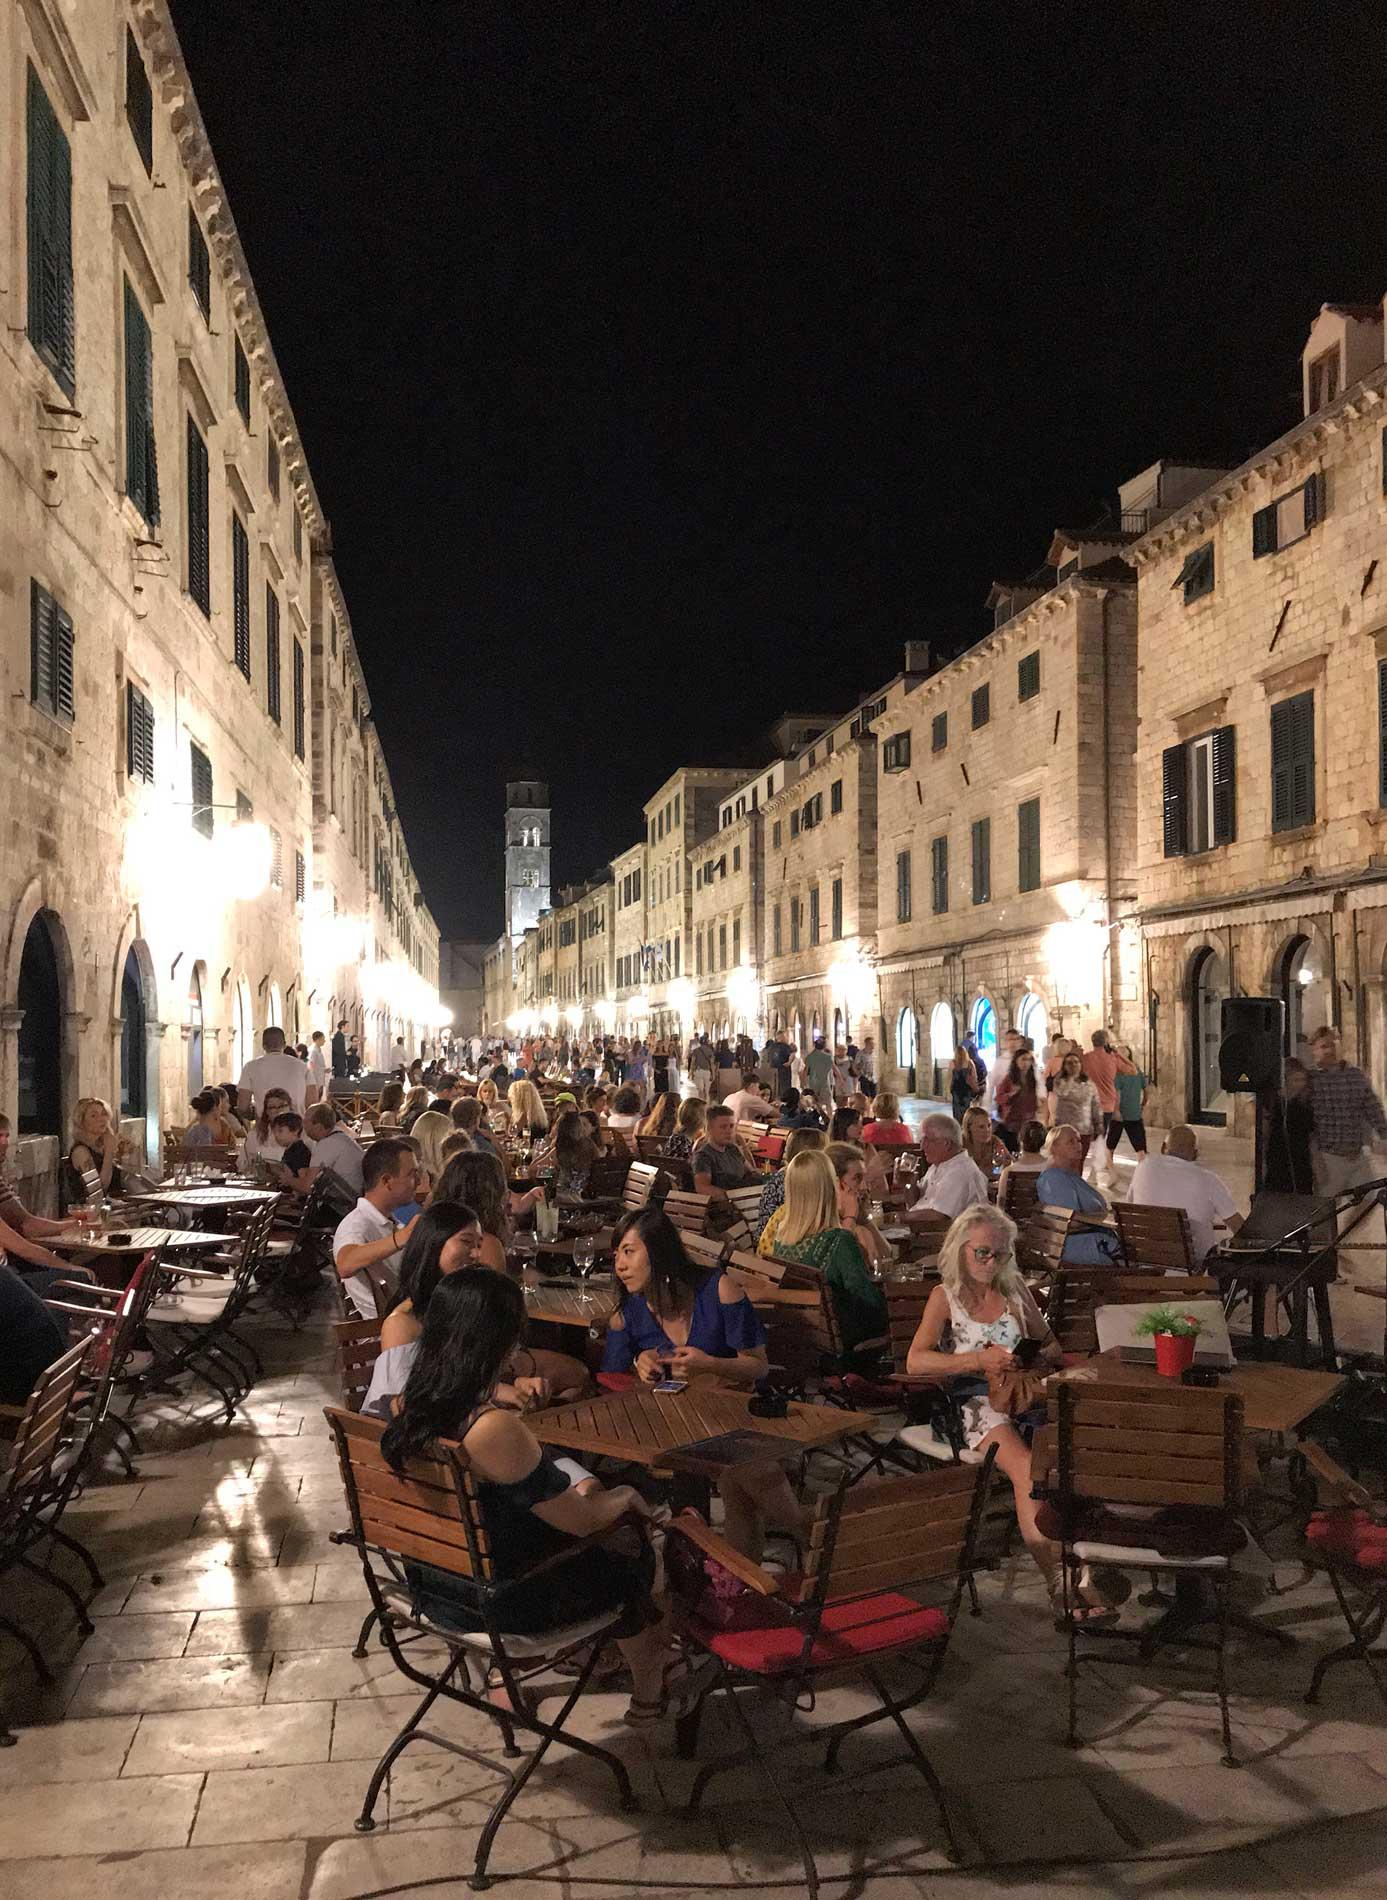 Dubrovnik-Croazia-Stradun-by-night-turisti-tanti-tavolini-ristoranti